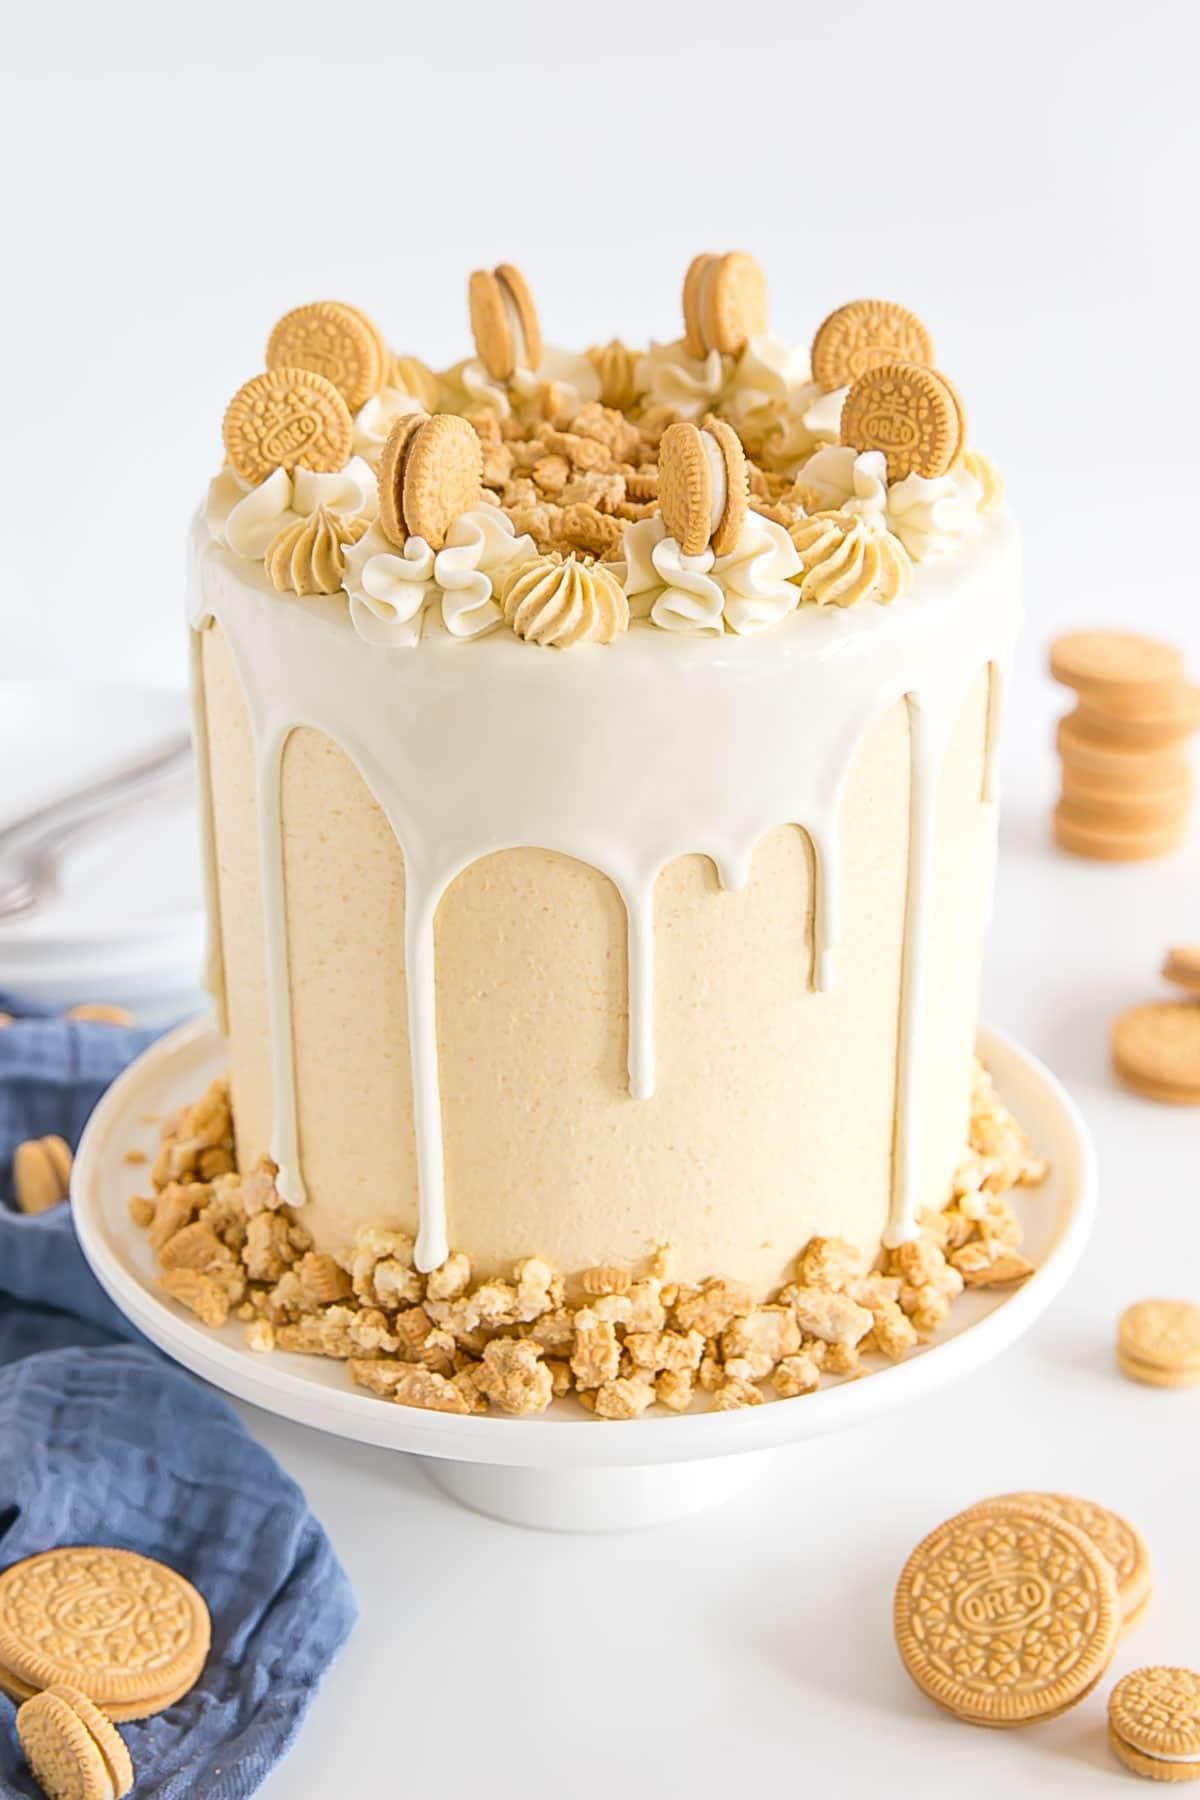 Angled shot of the cake.